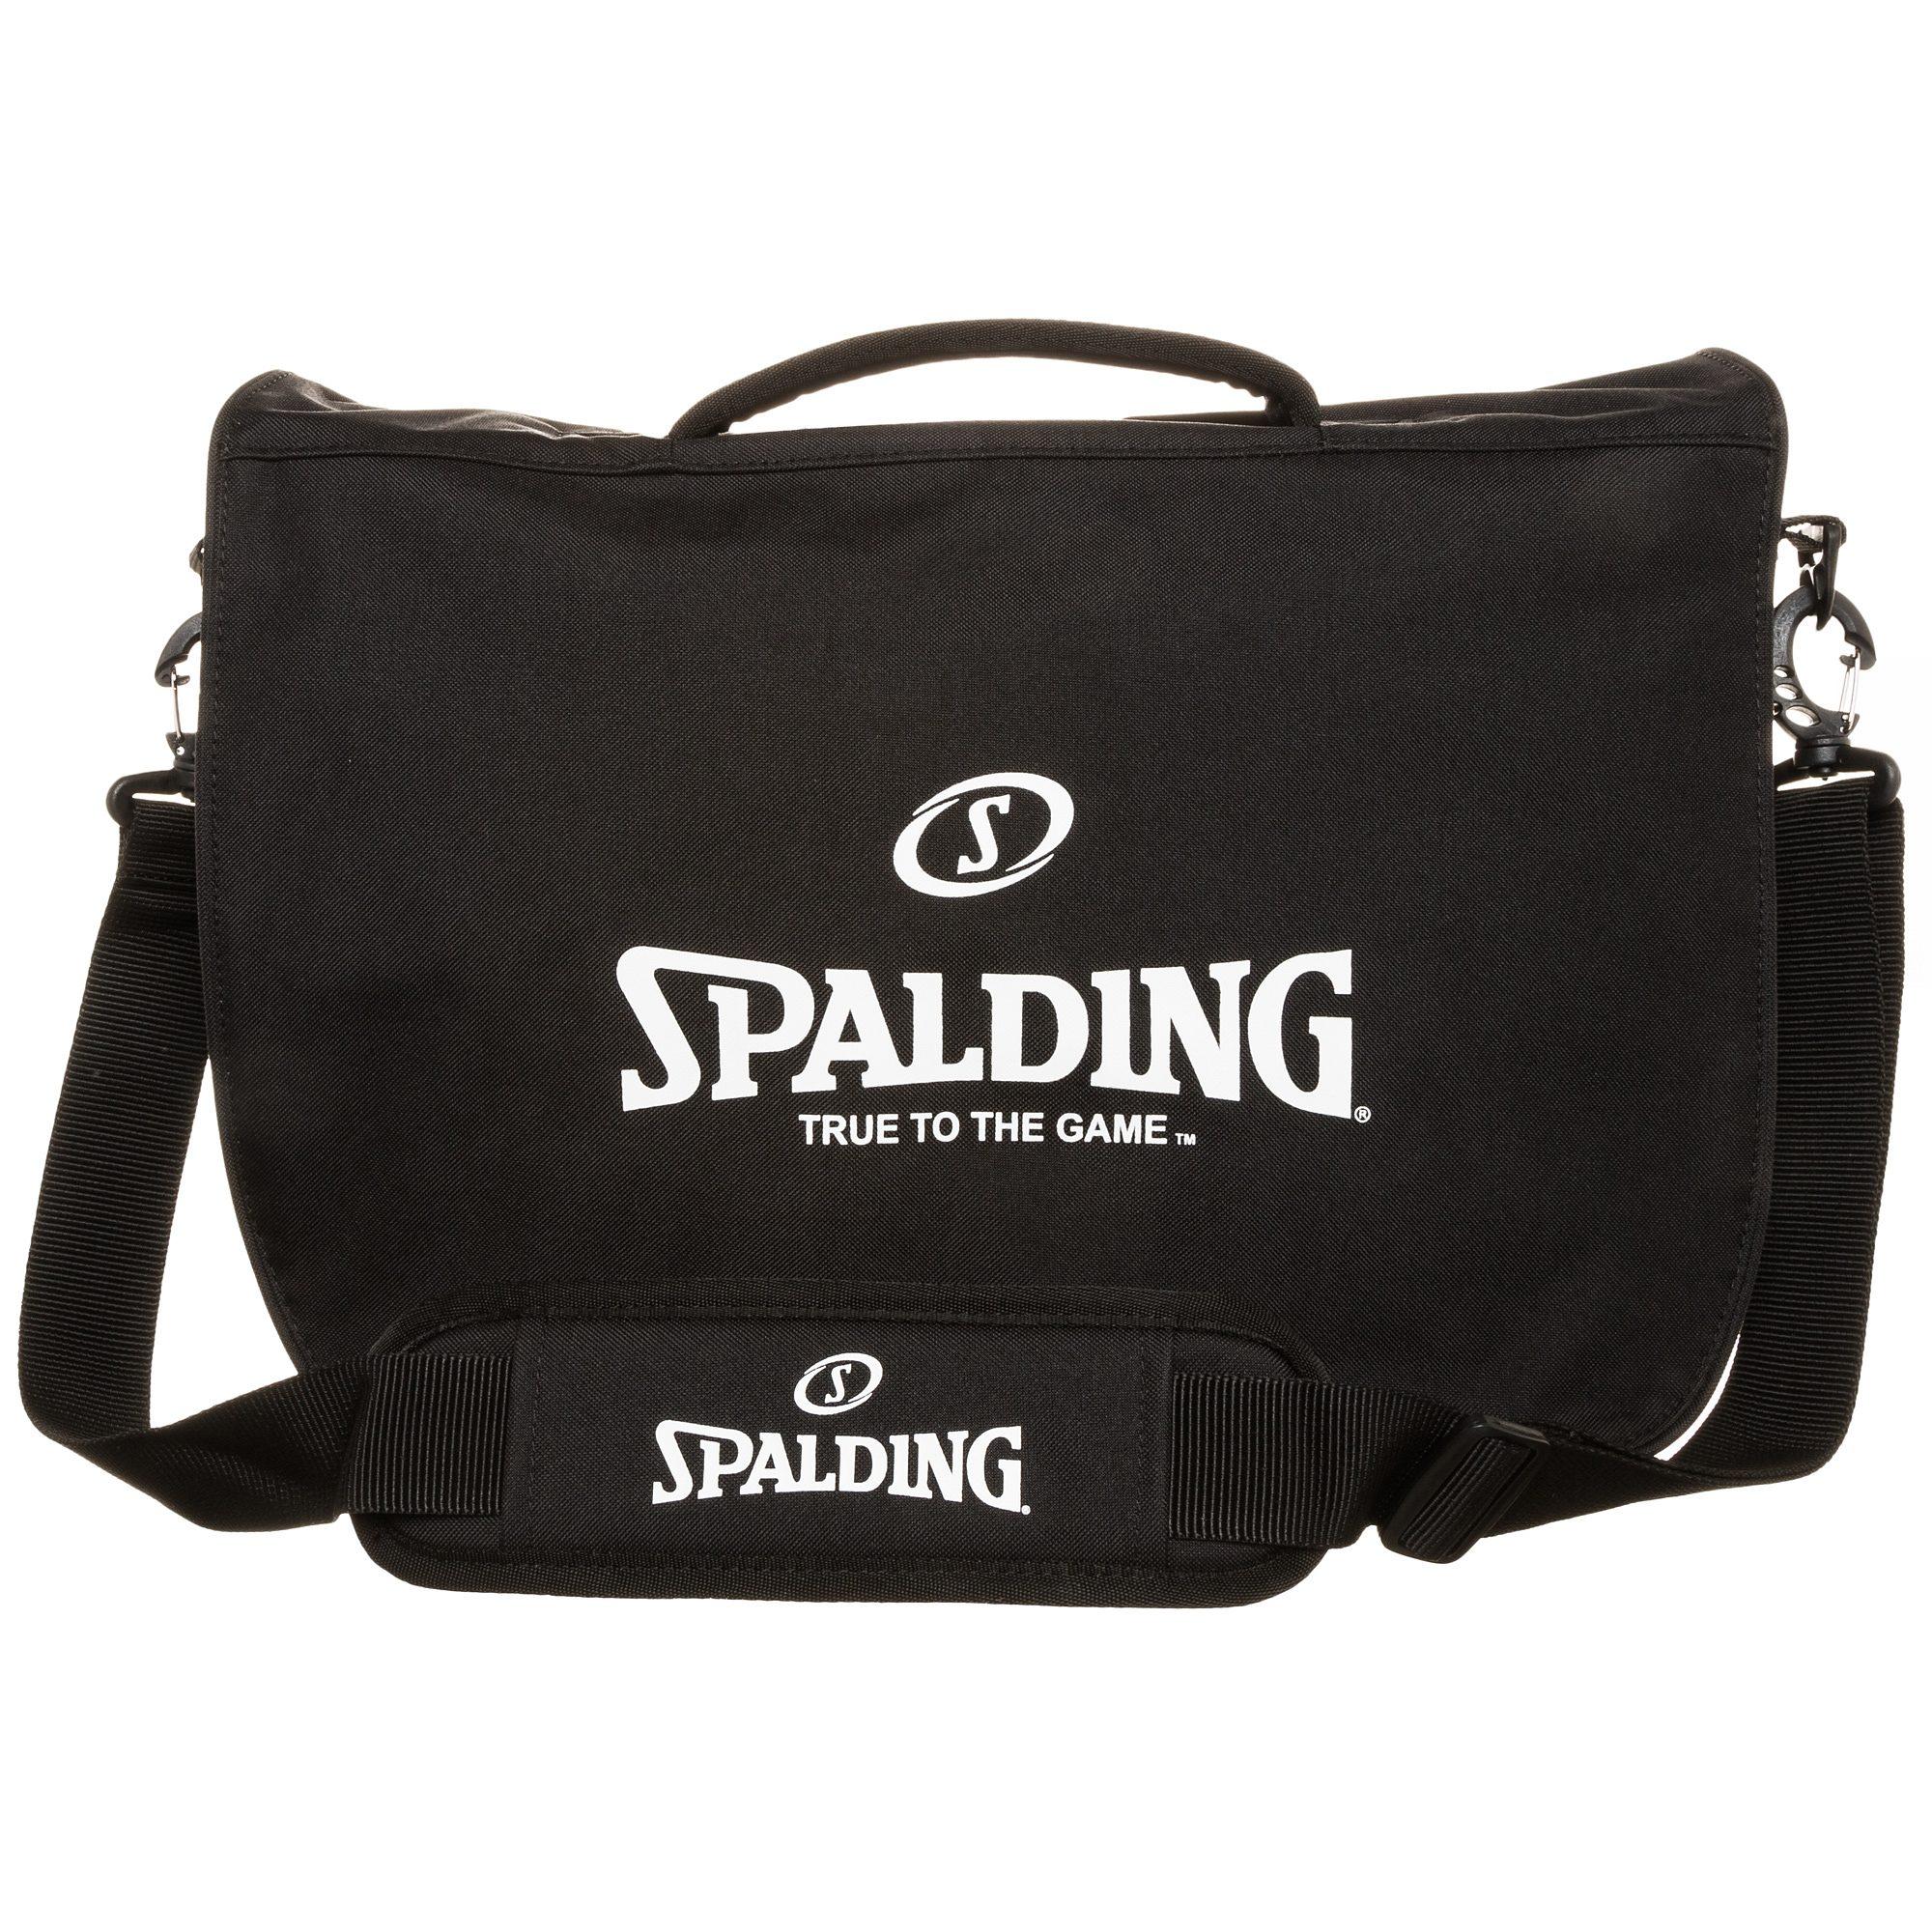 SPALDING Briefcase